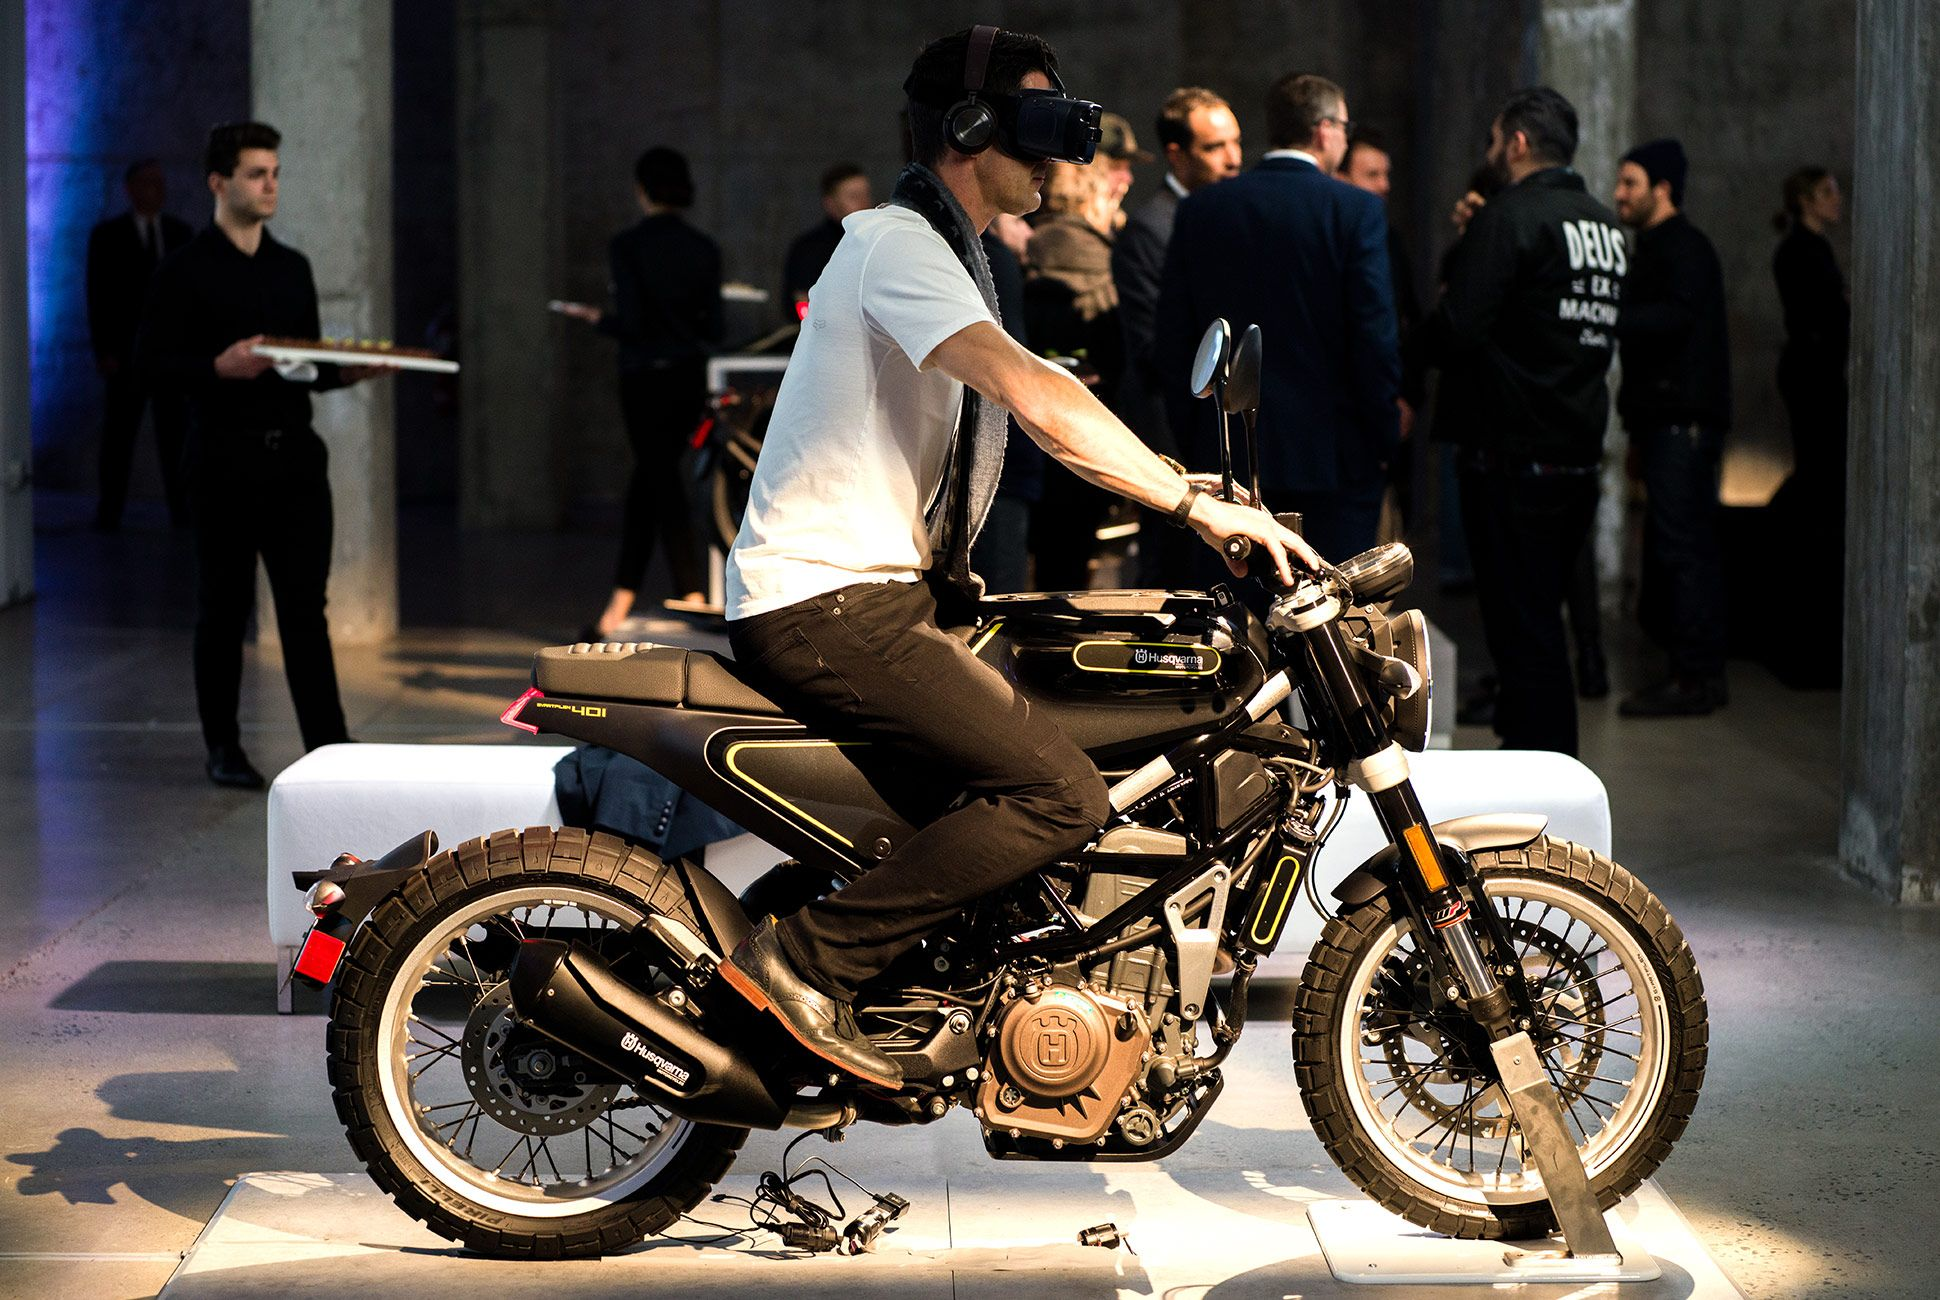 Husqvarna-Motorcycle-gear-patrol-1